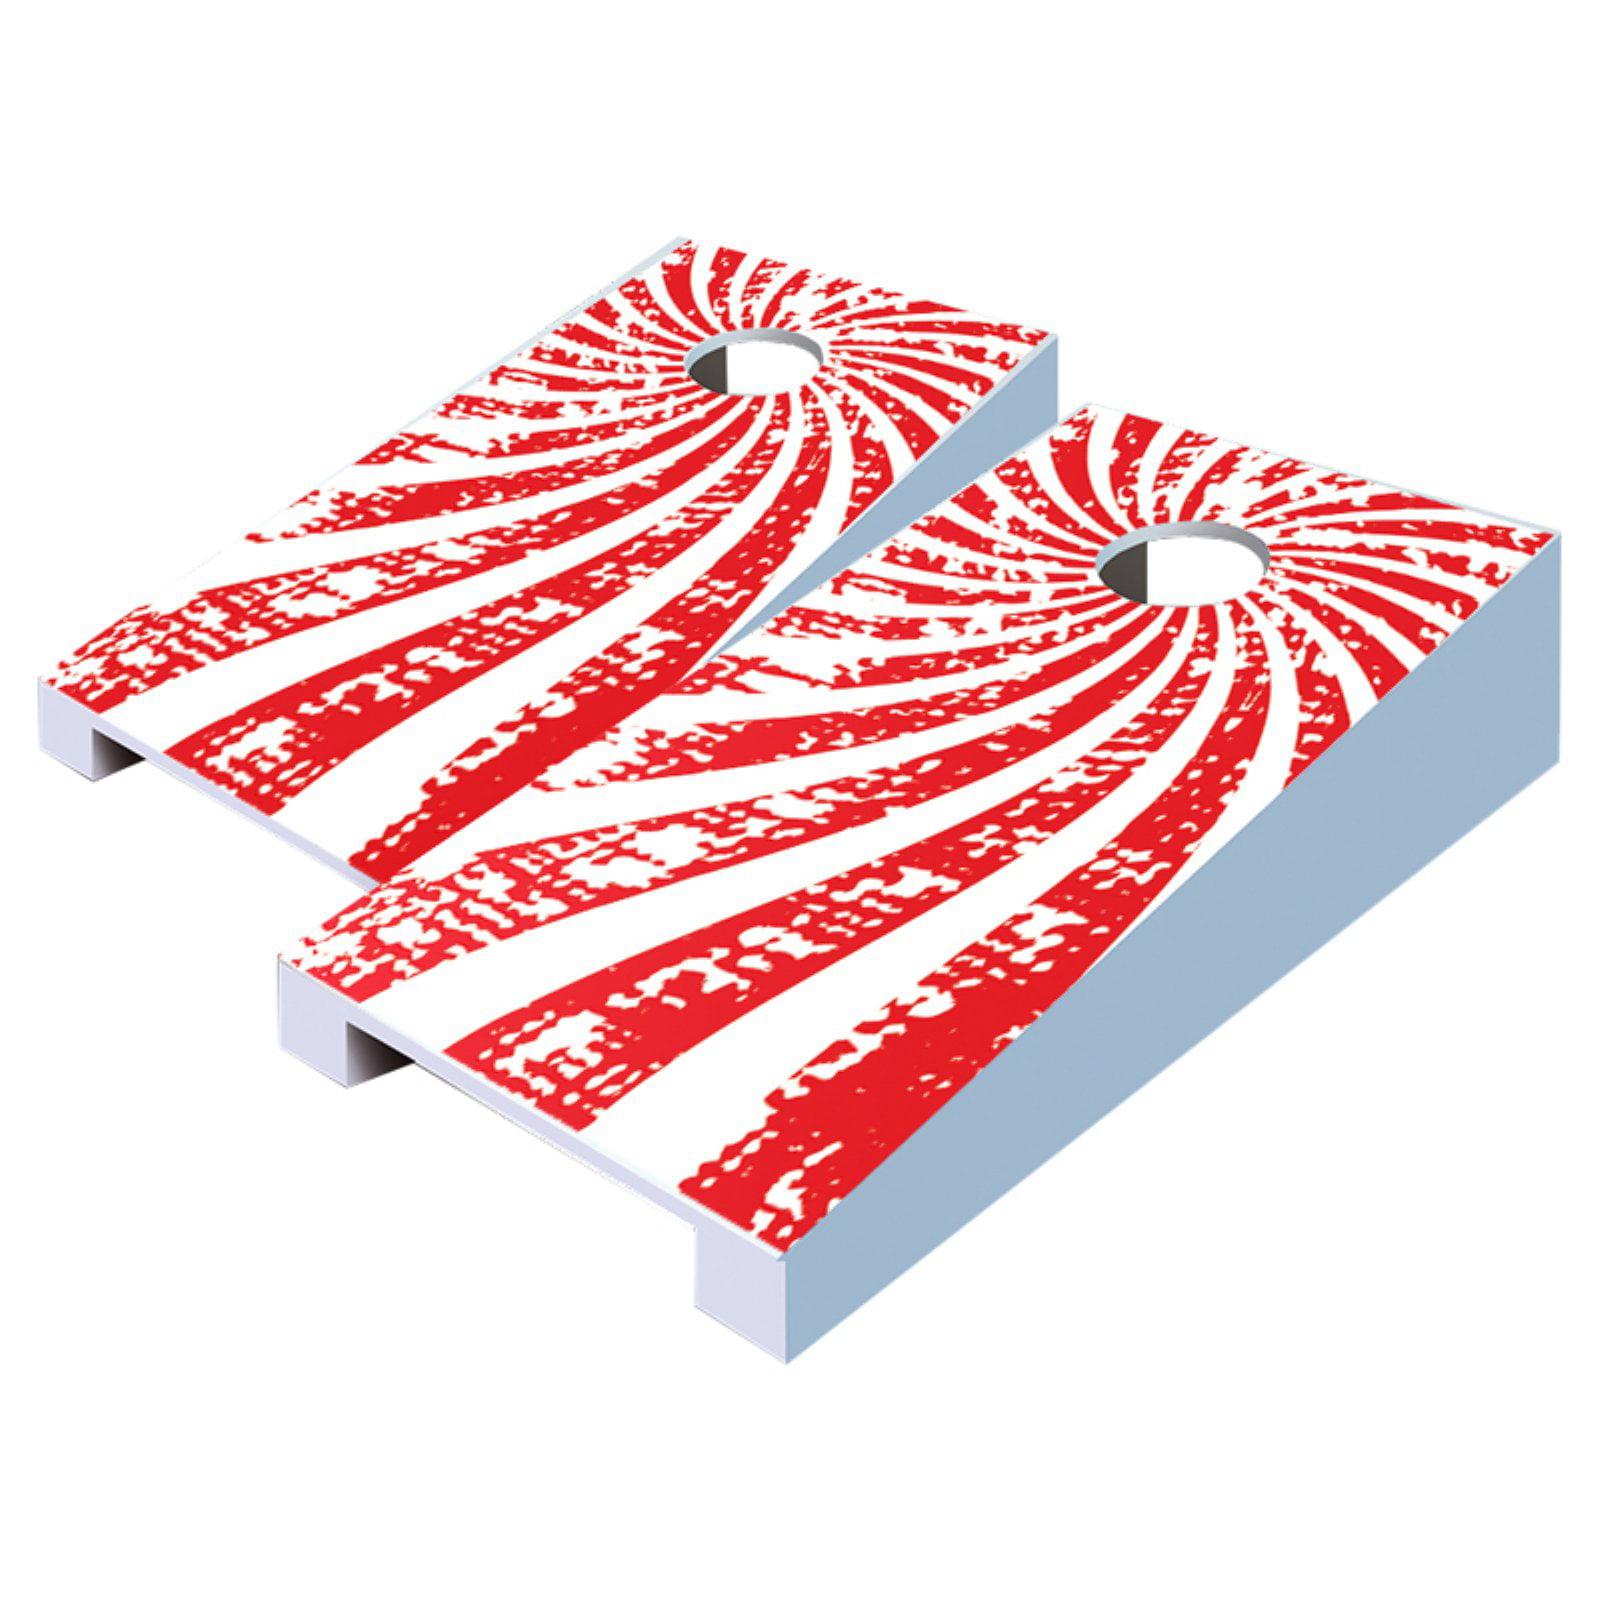 Swirl Tabletop Cornhole Set by AJJ Cornhole